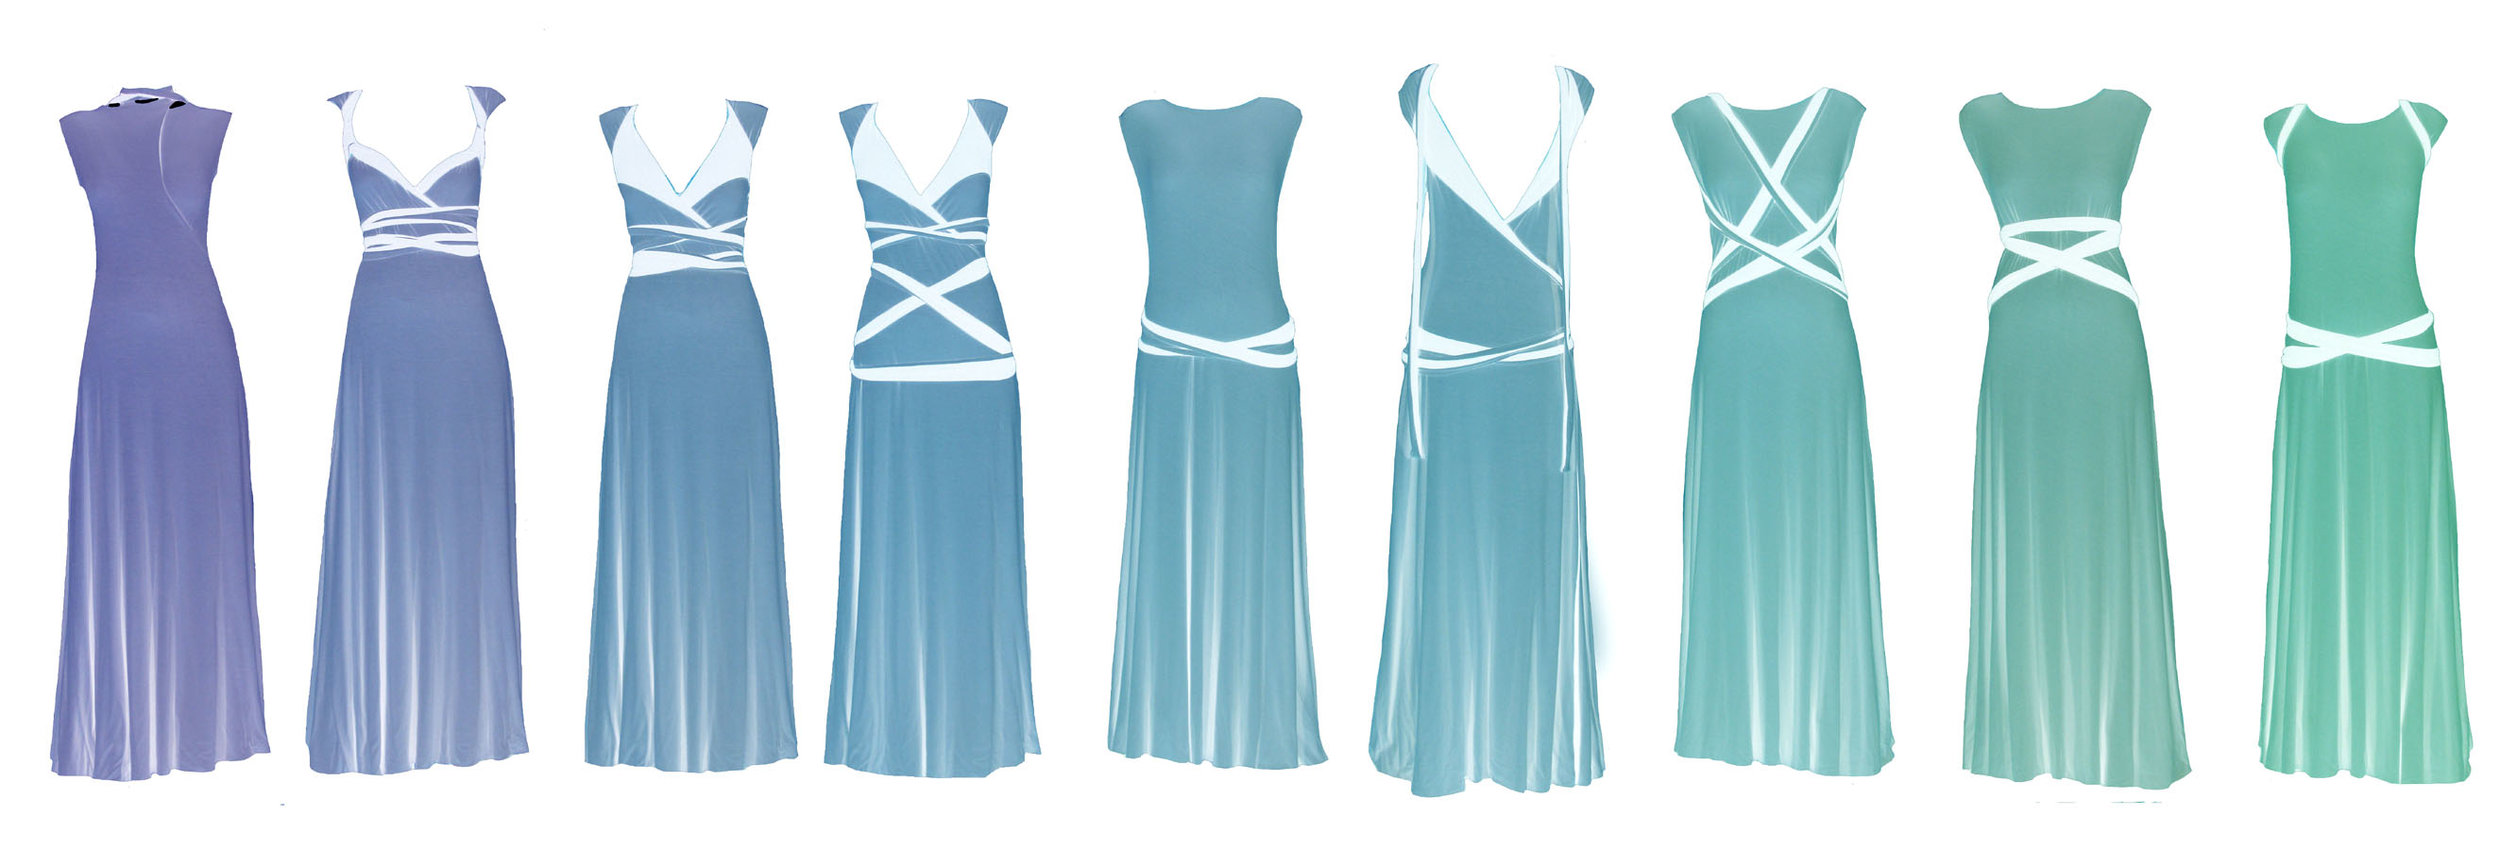 4 all wrap dress.jpg